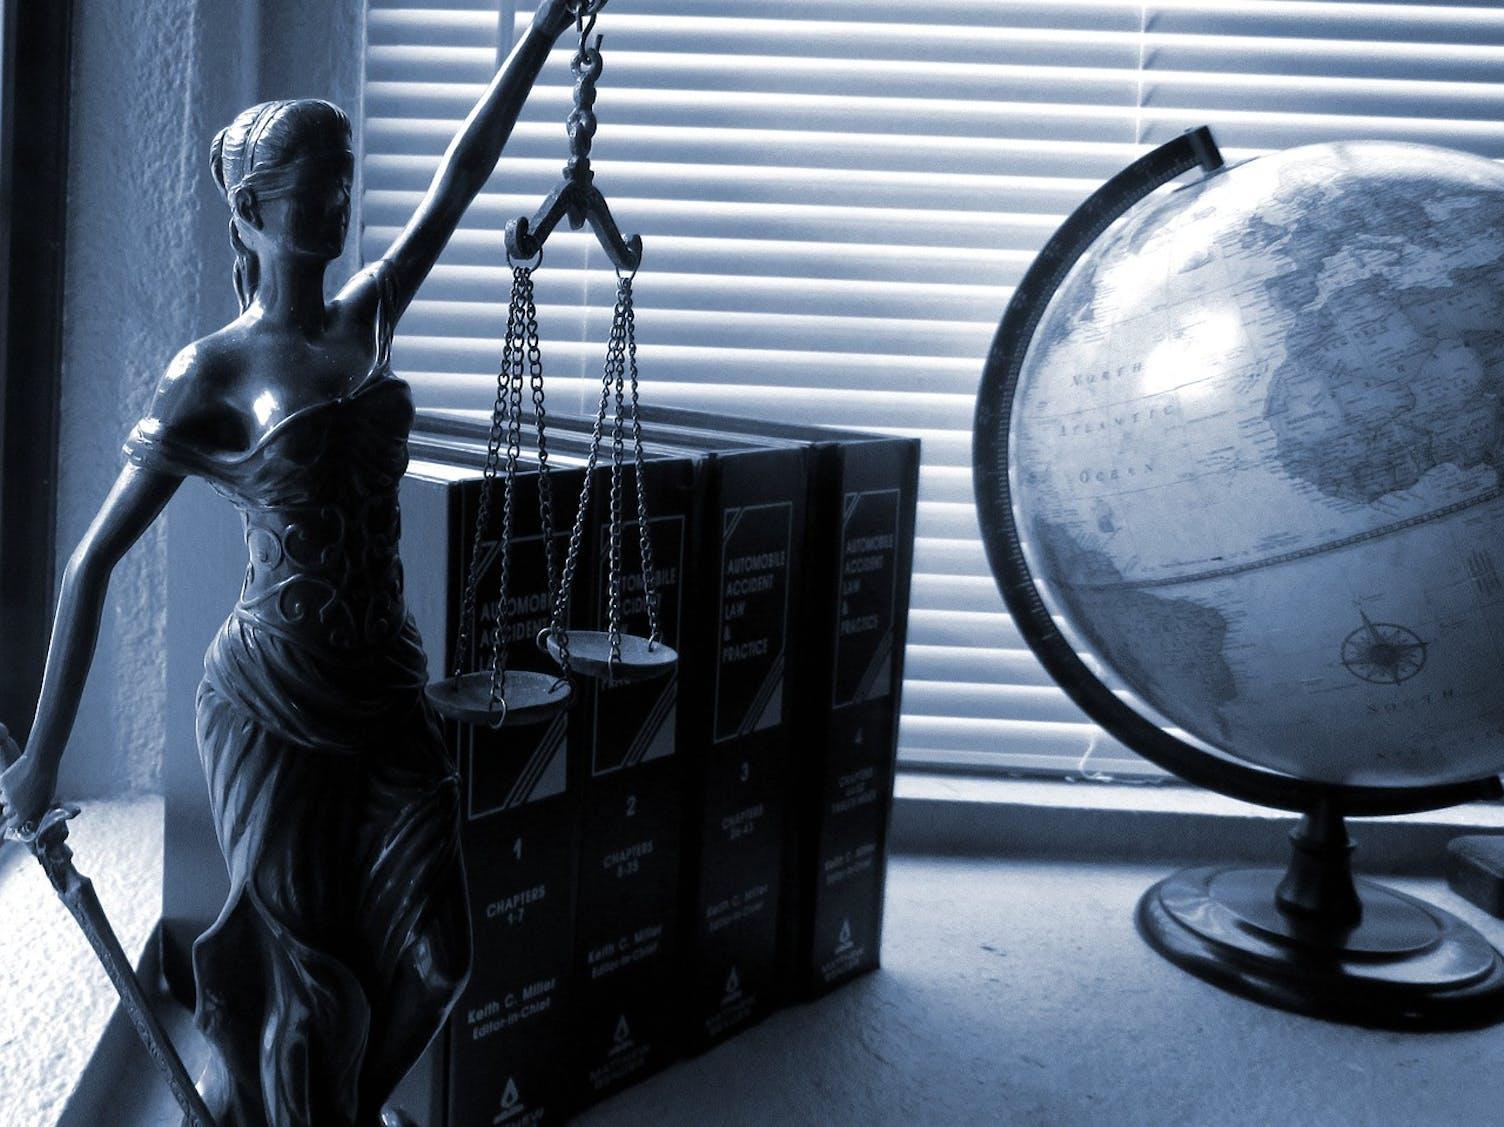 Anwalt Gesetz Recht